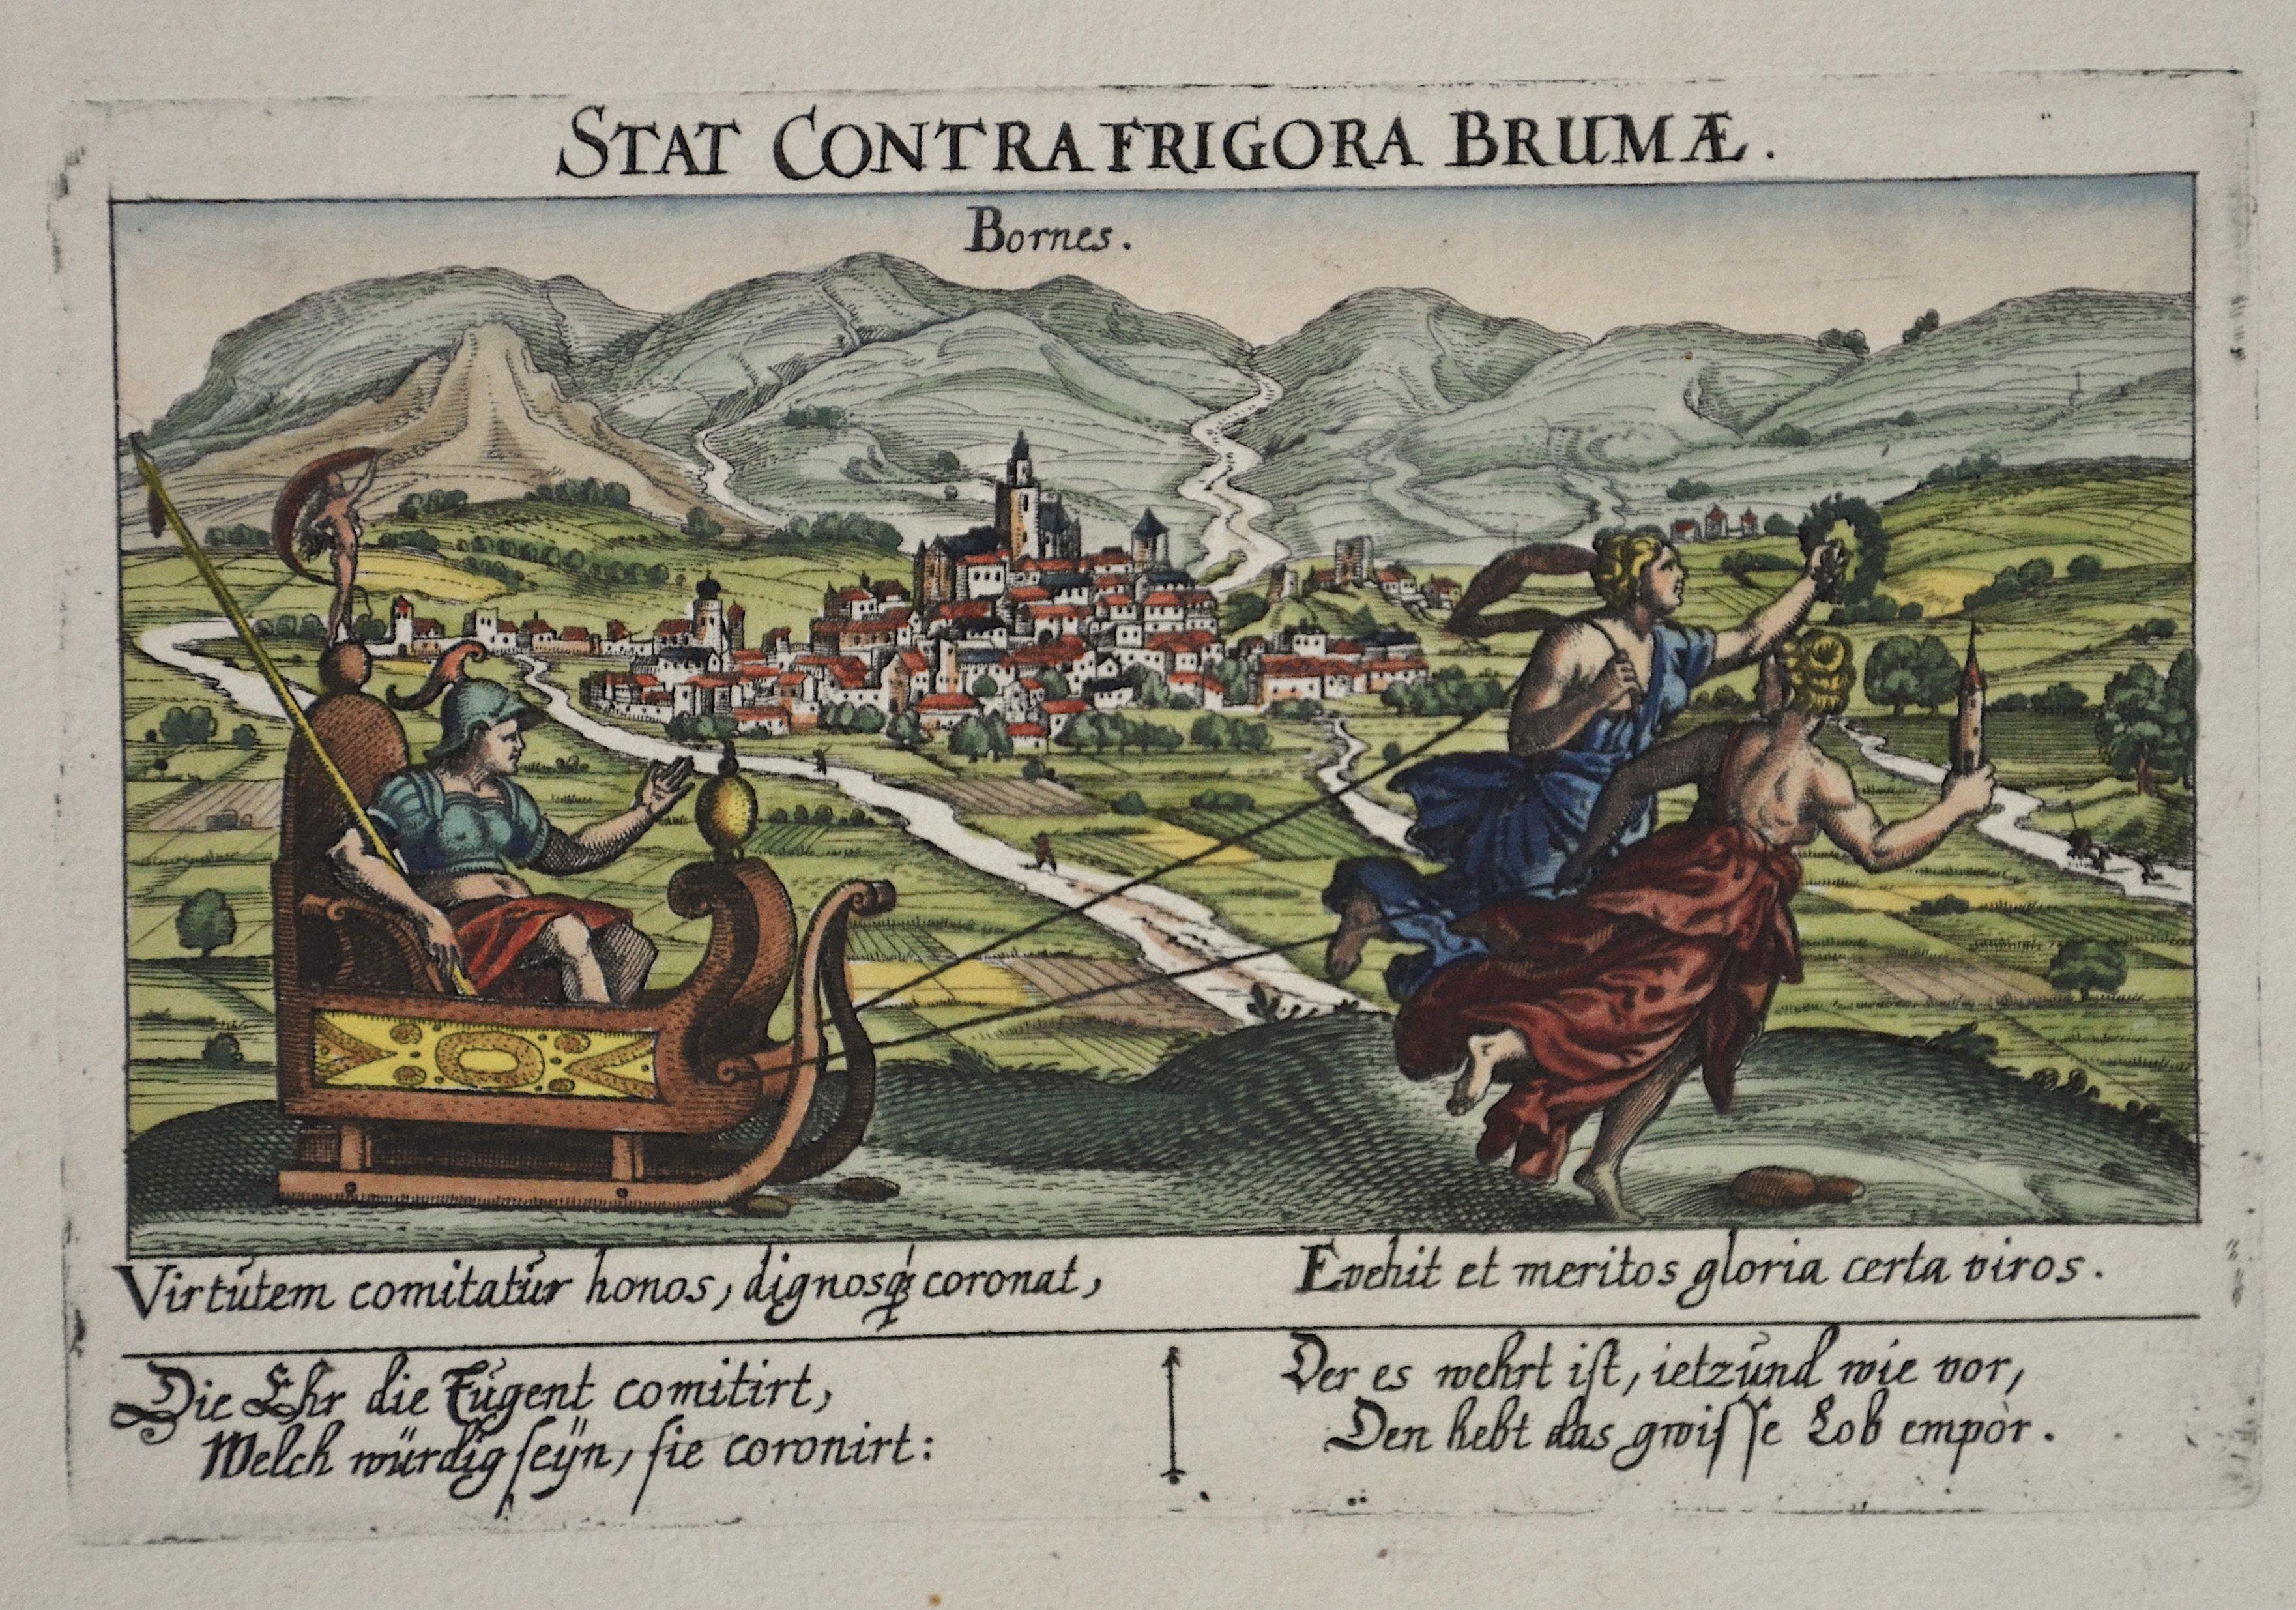 Nürnberger Schatzkästchen  Stat contrafrigora Brumae